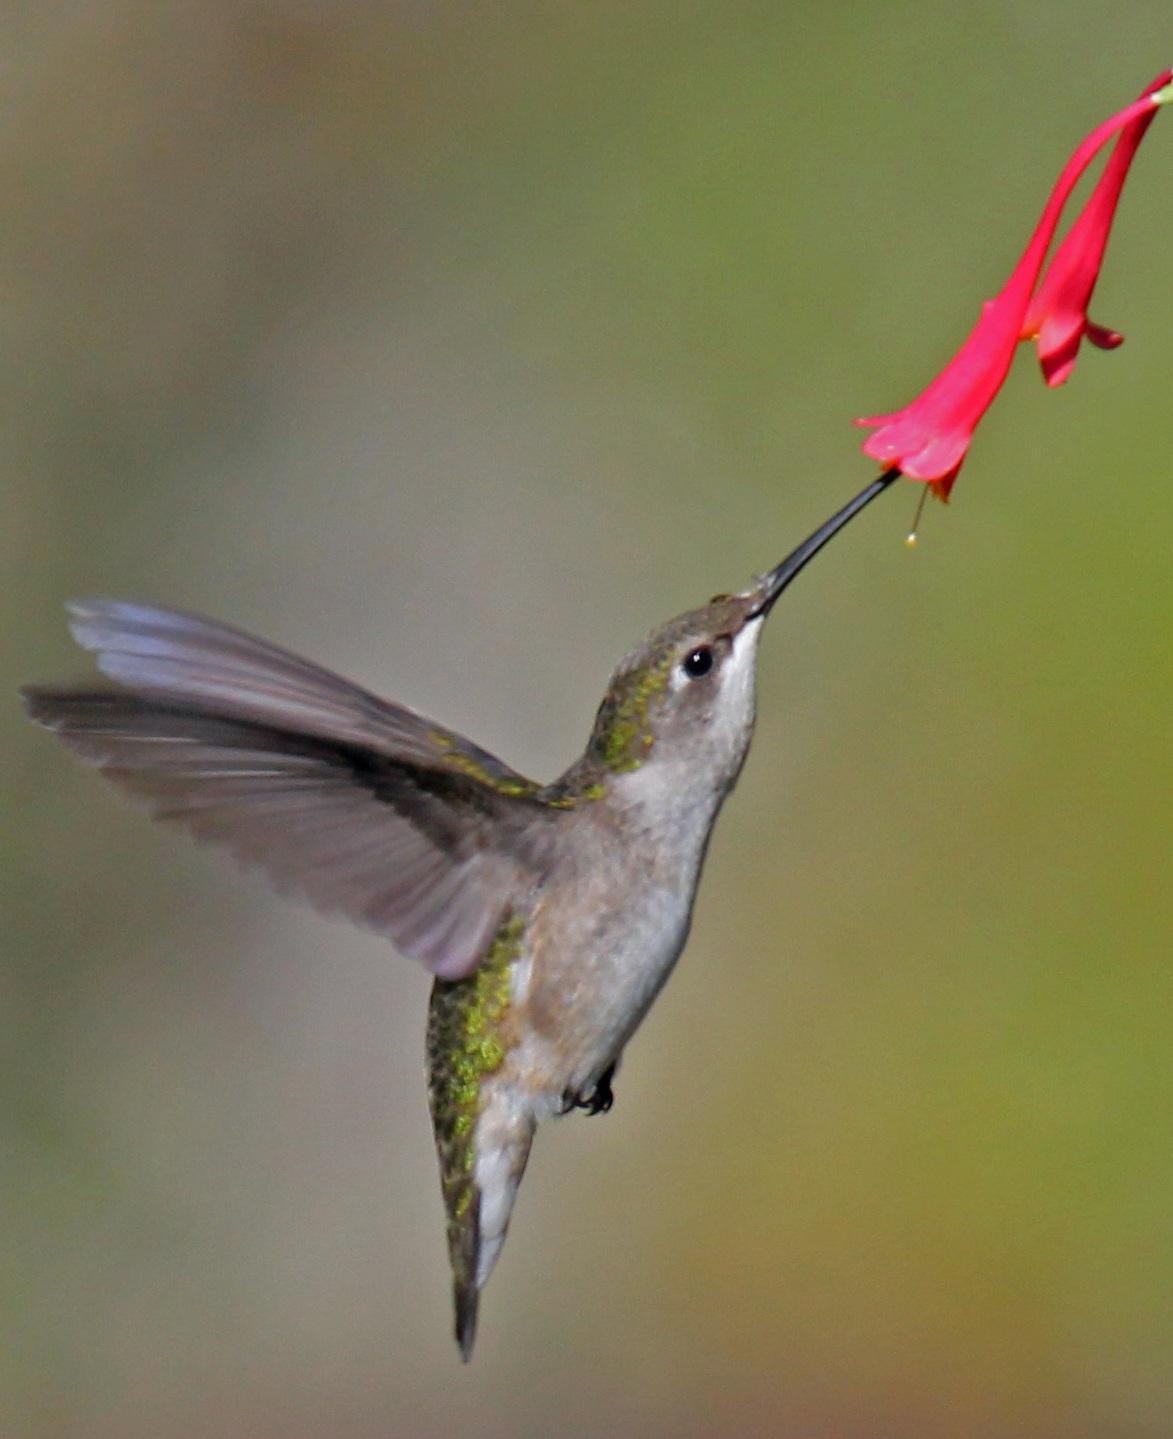 ruby+throated+hummingbird+wiki.jpg